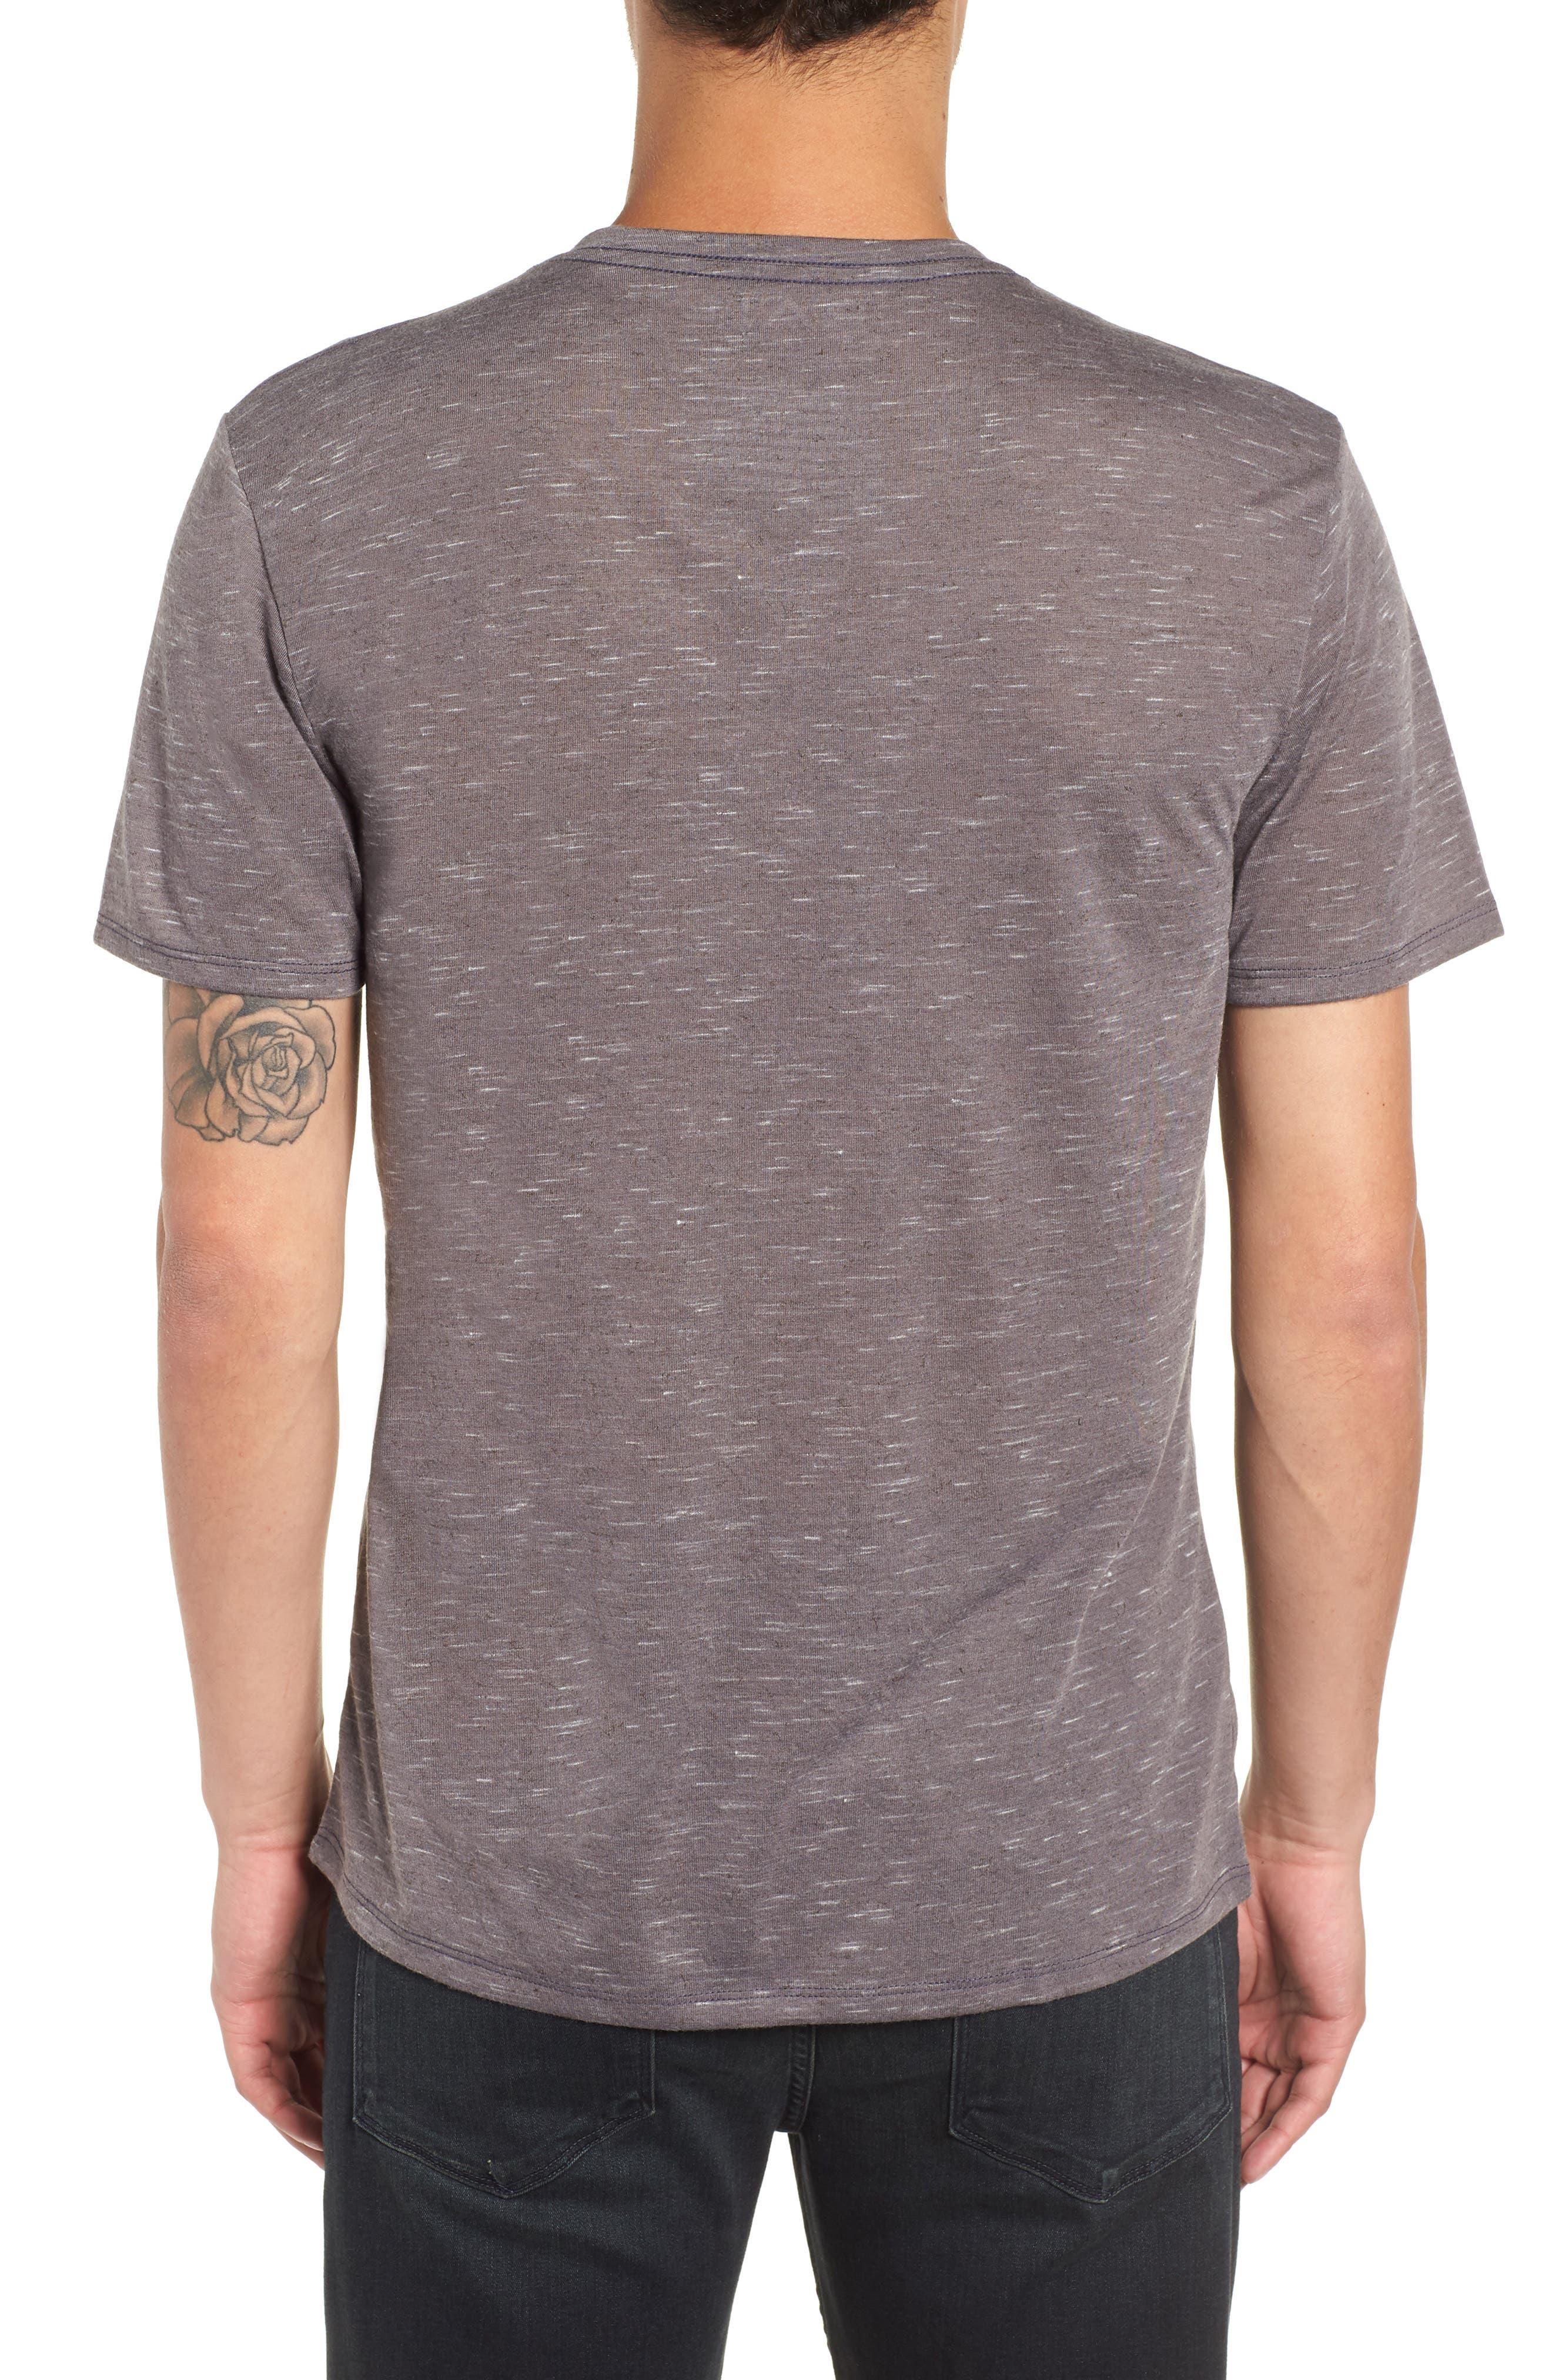 THE RAIL, Streaky V-Neck T-Shirt, Alternate thumbnail 2, color, GREY TORNADO- WHITE